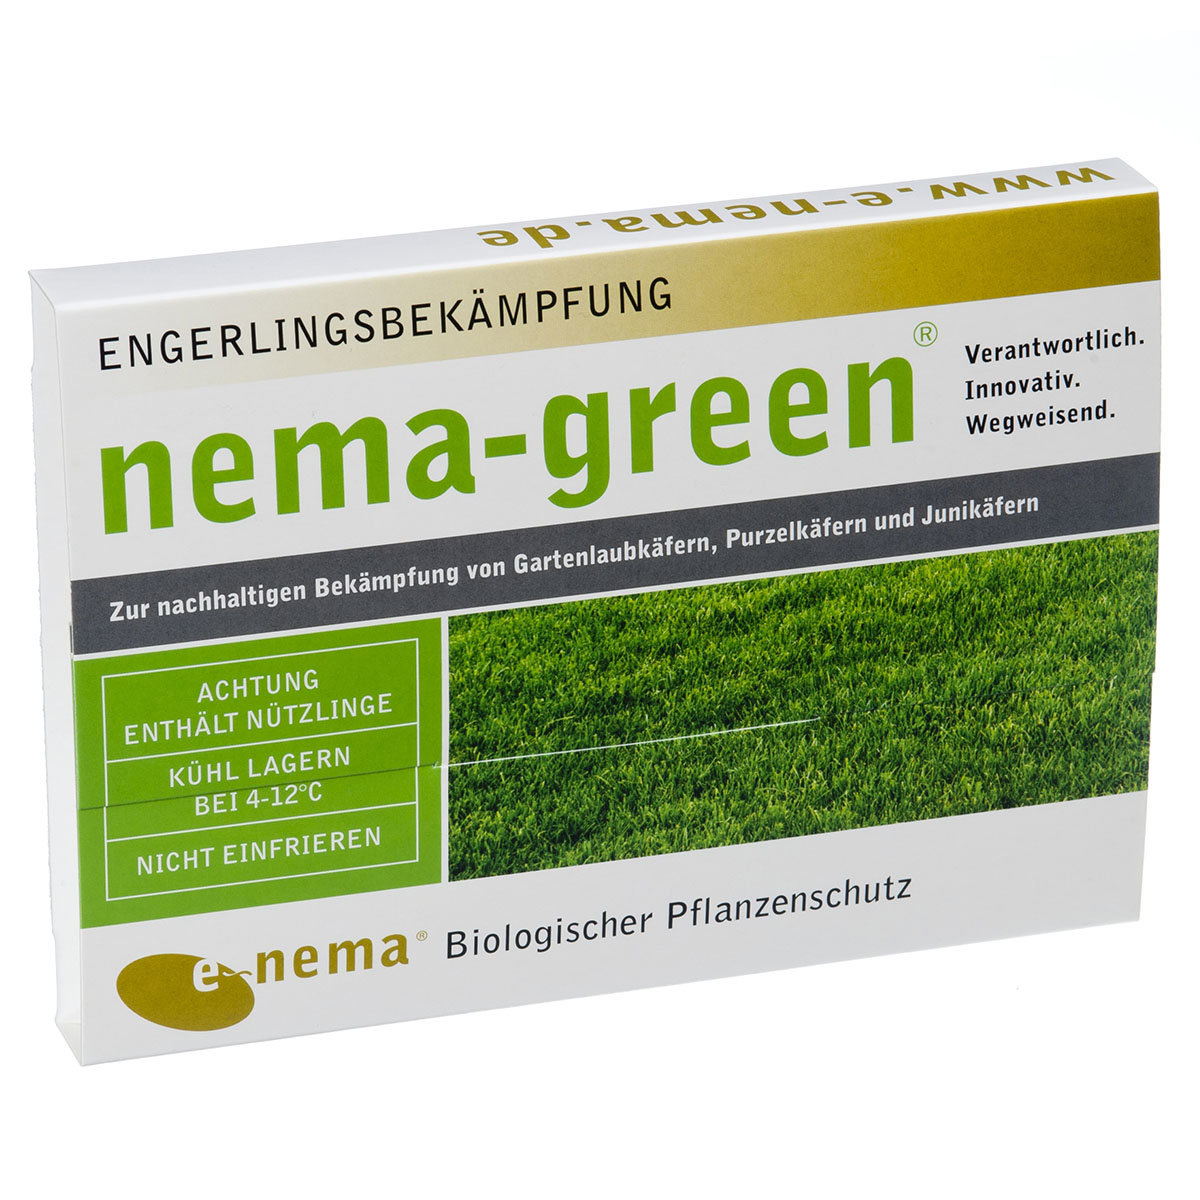 nema-green Nematoden gegen Rasenschädlinge, 50 Mio.